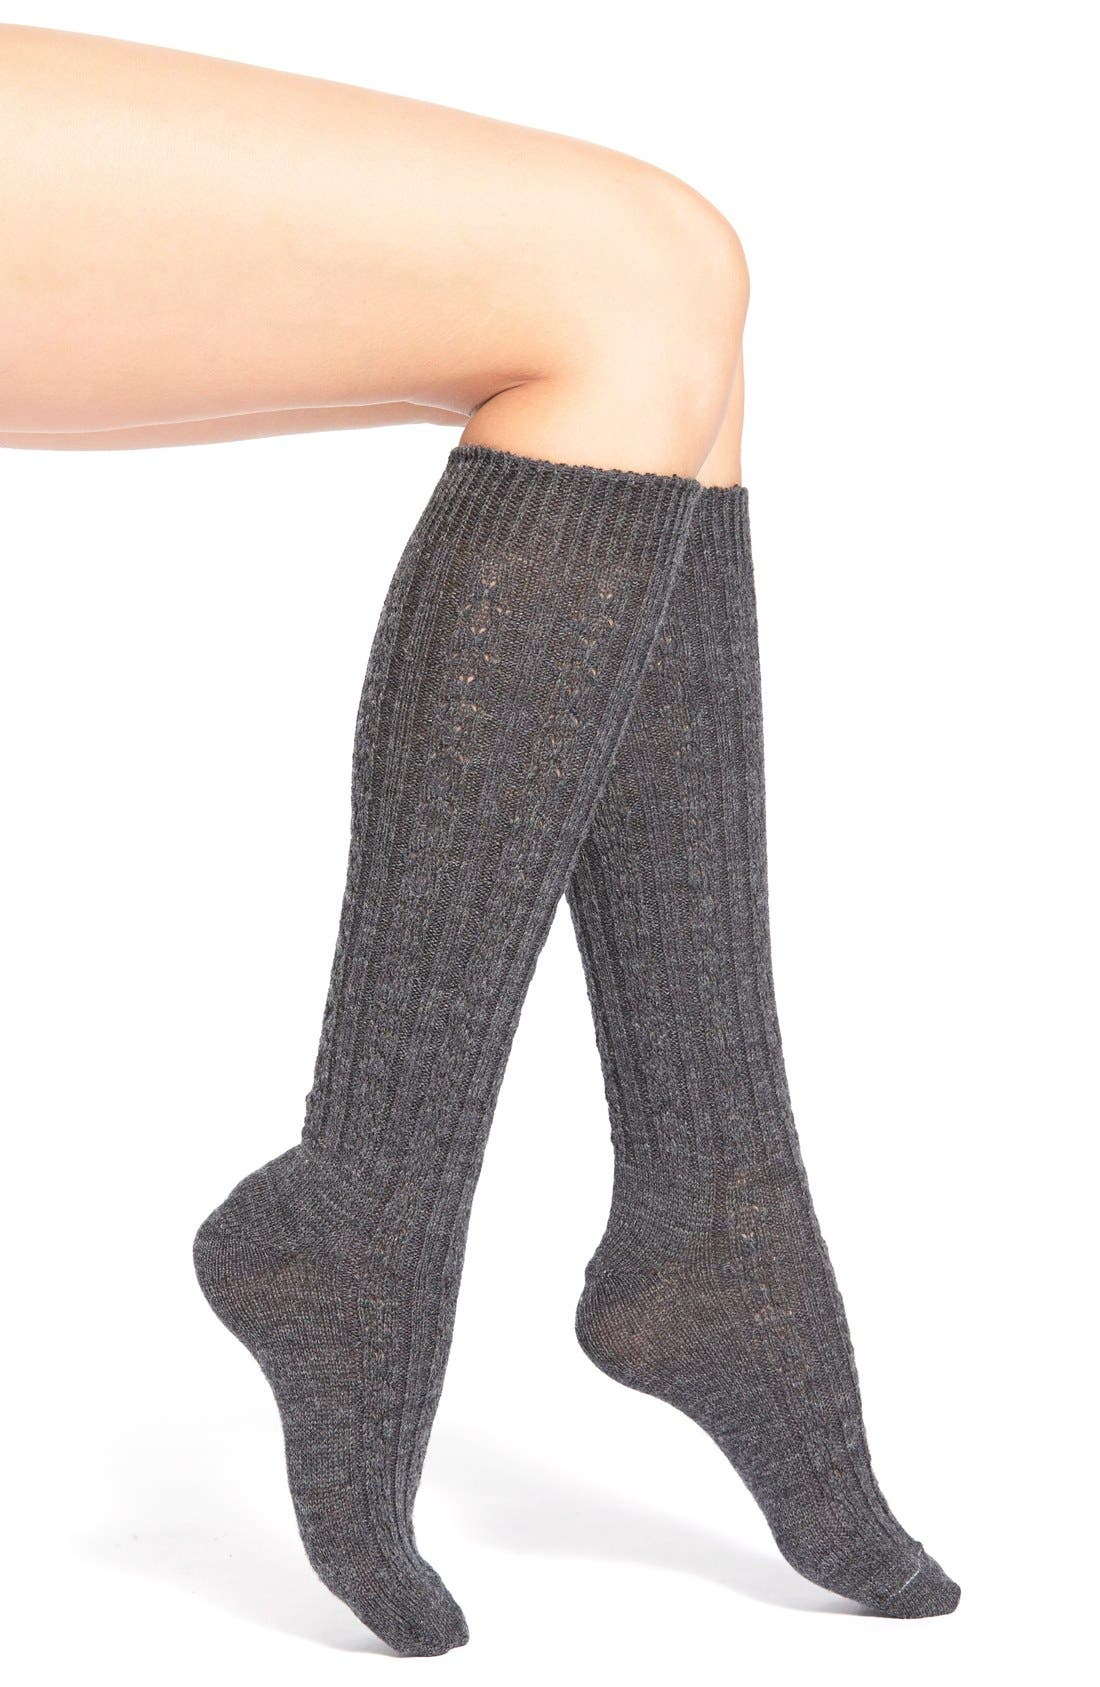 Cable Knit Knee Socks,                             Main thumbnail 2, color,